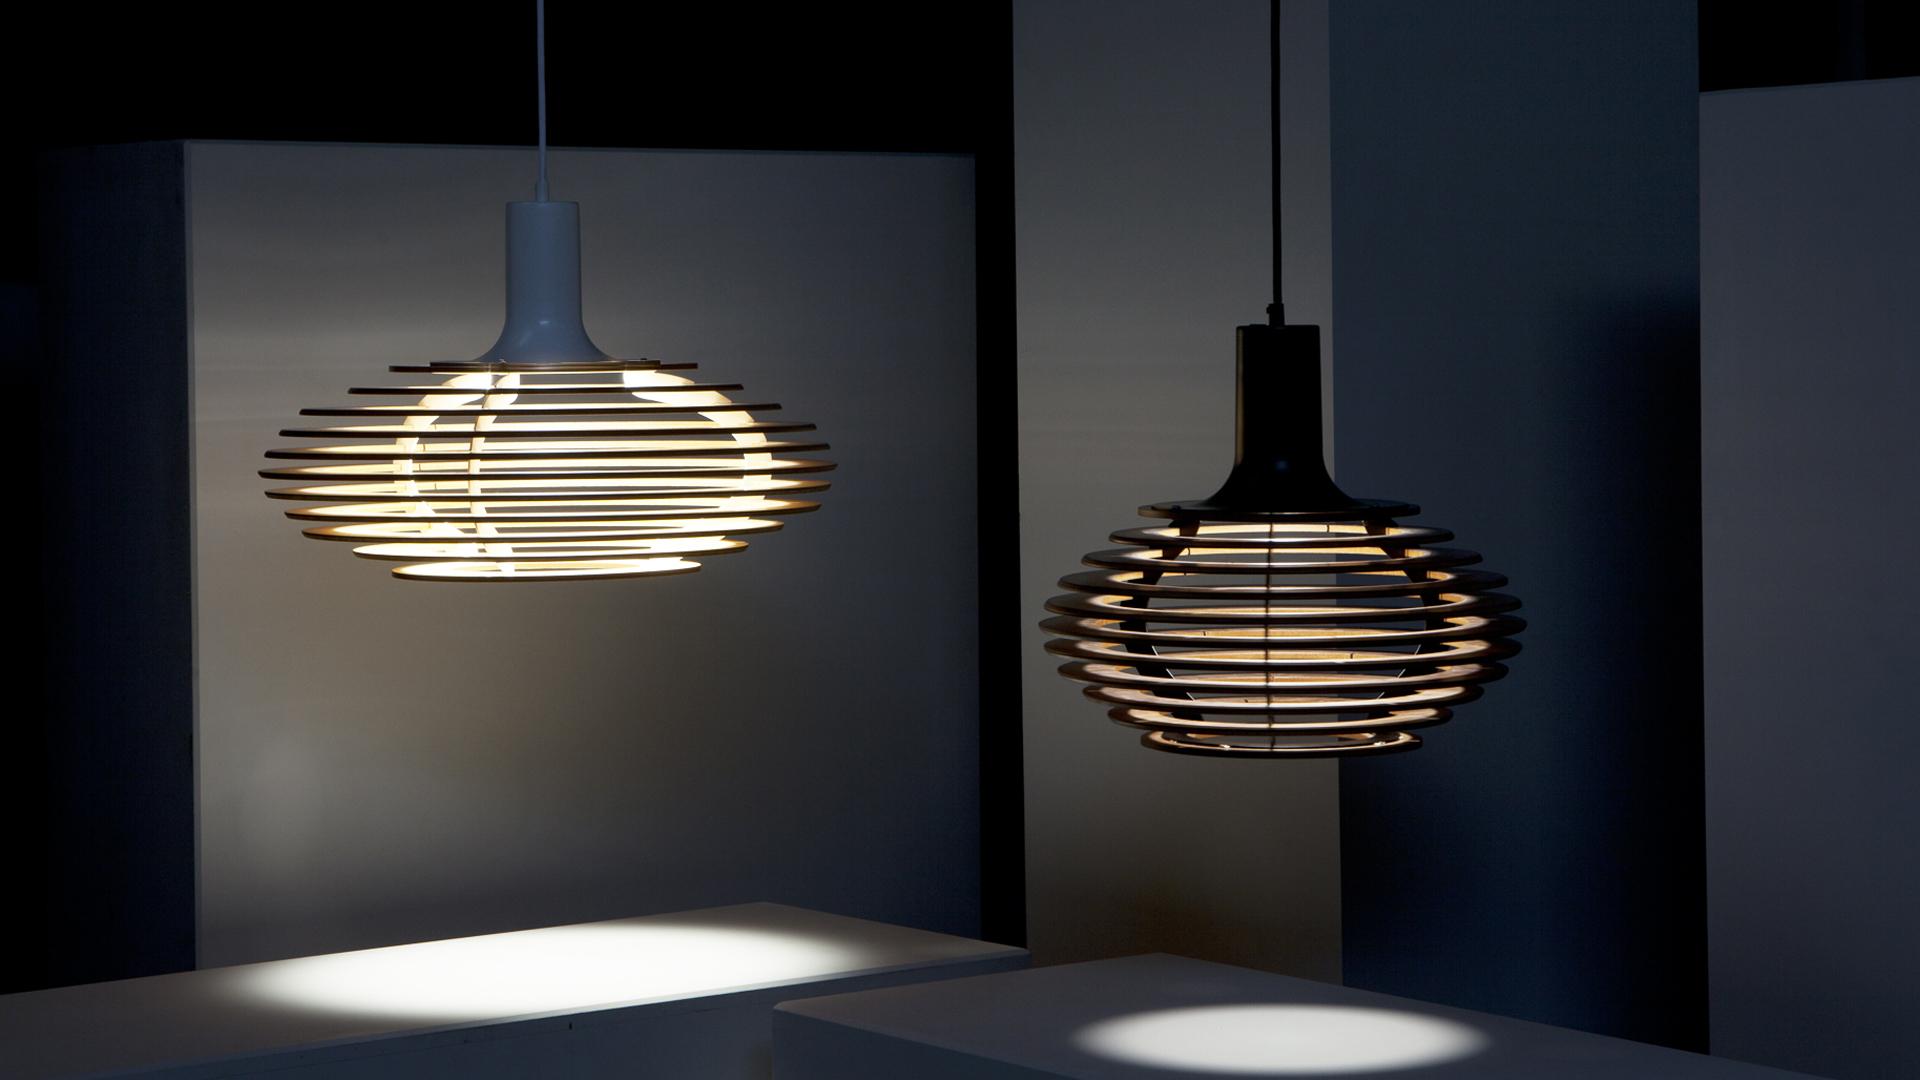 Dipper by Viewport Studio / Decode London, unusual and functional chandelier